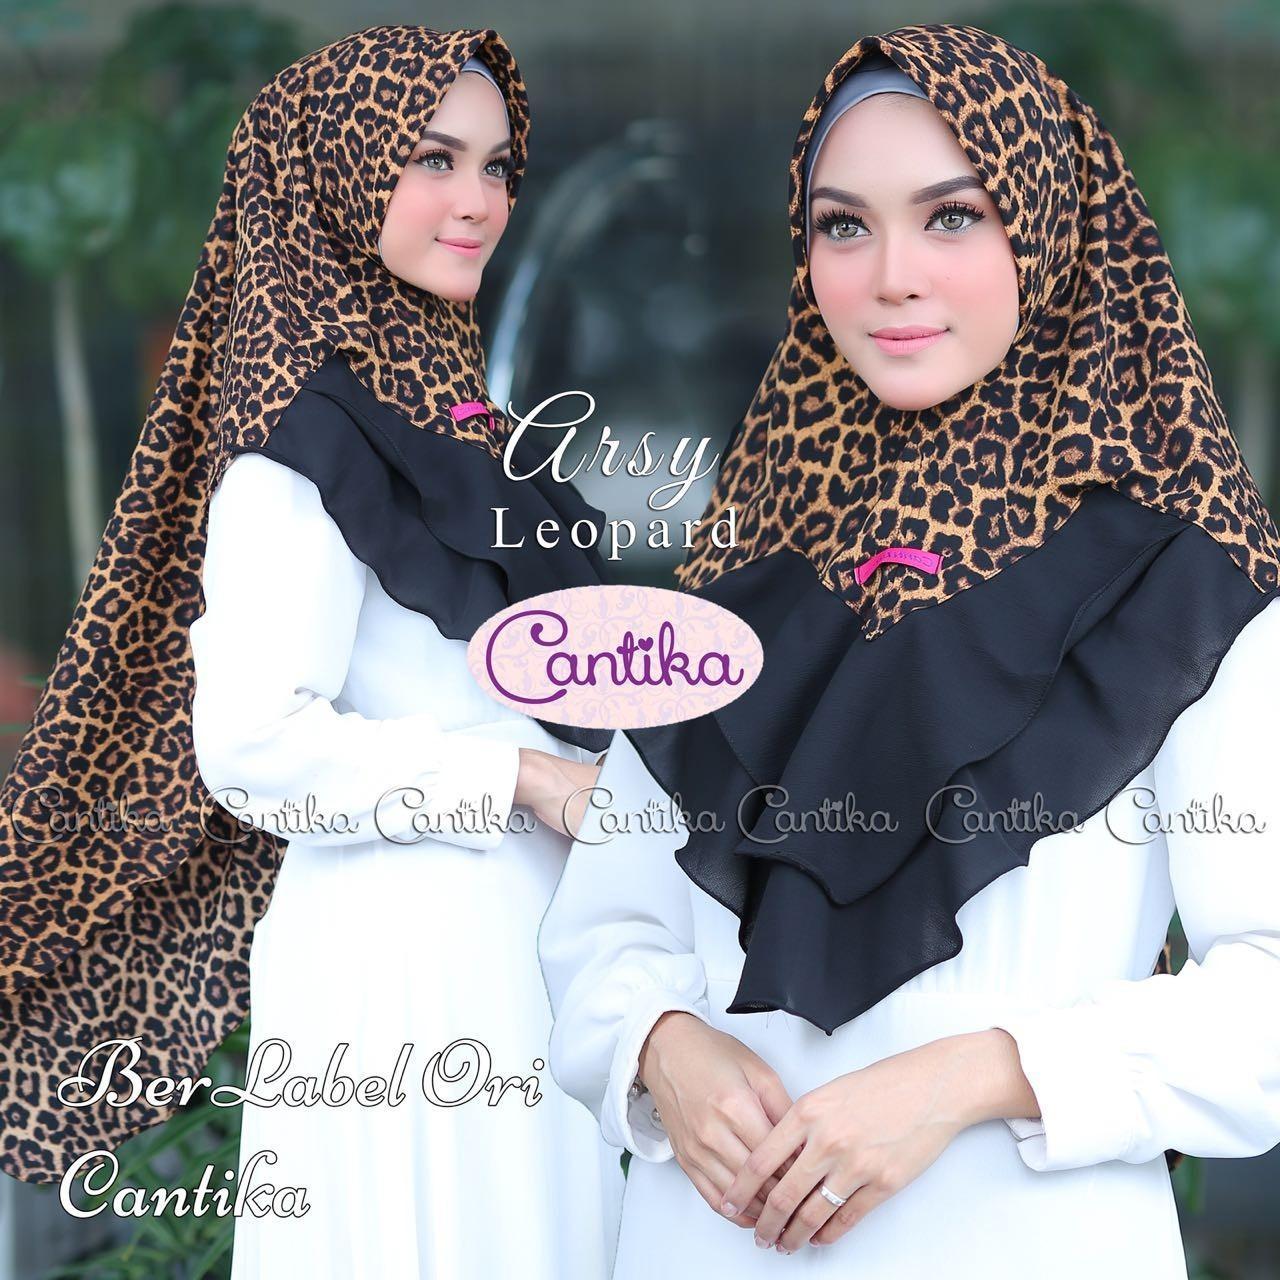 Daftar Harga Hijab Pasminah Sifon Termurah November 2018 Jilbab Instan Aisyah Serut Mooie Kerudung Khimar Syari Leopard Antem Combi Cantika